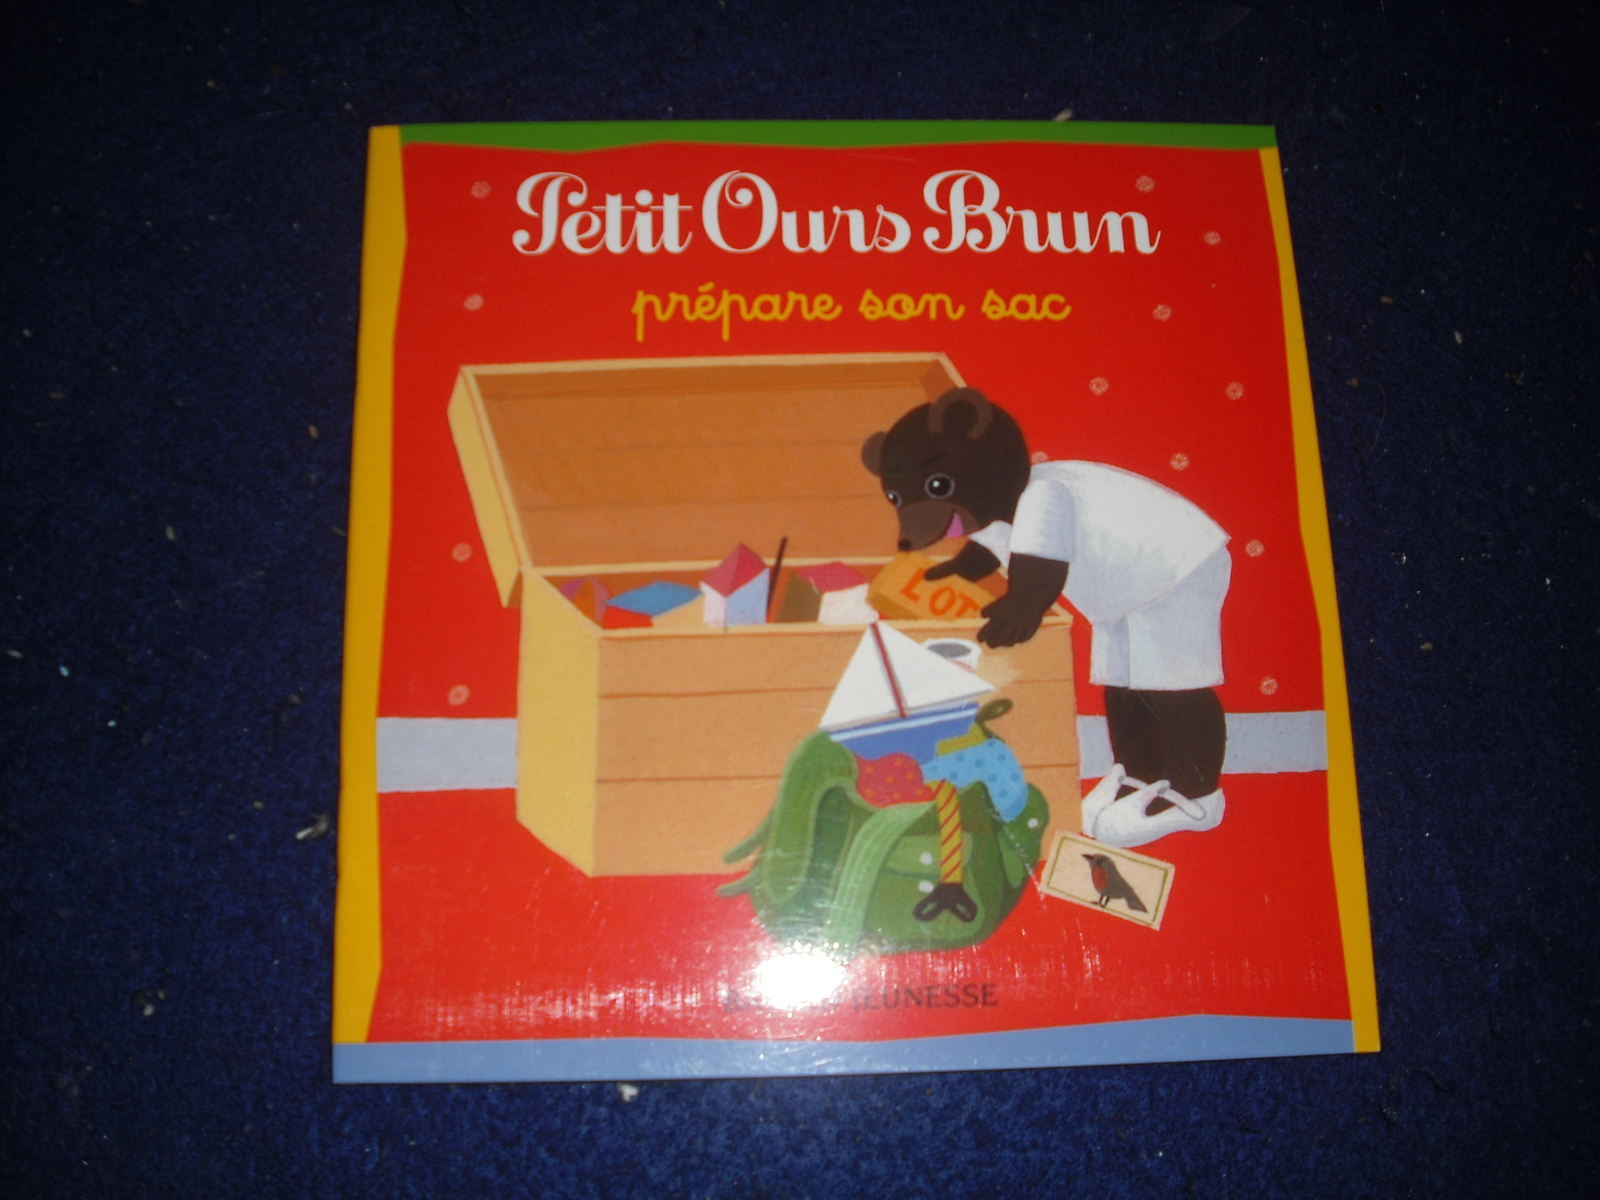 Petit Ours Brun prepare son sac by Marie Aubinais